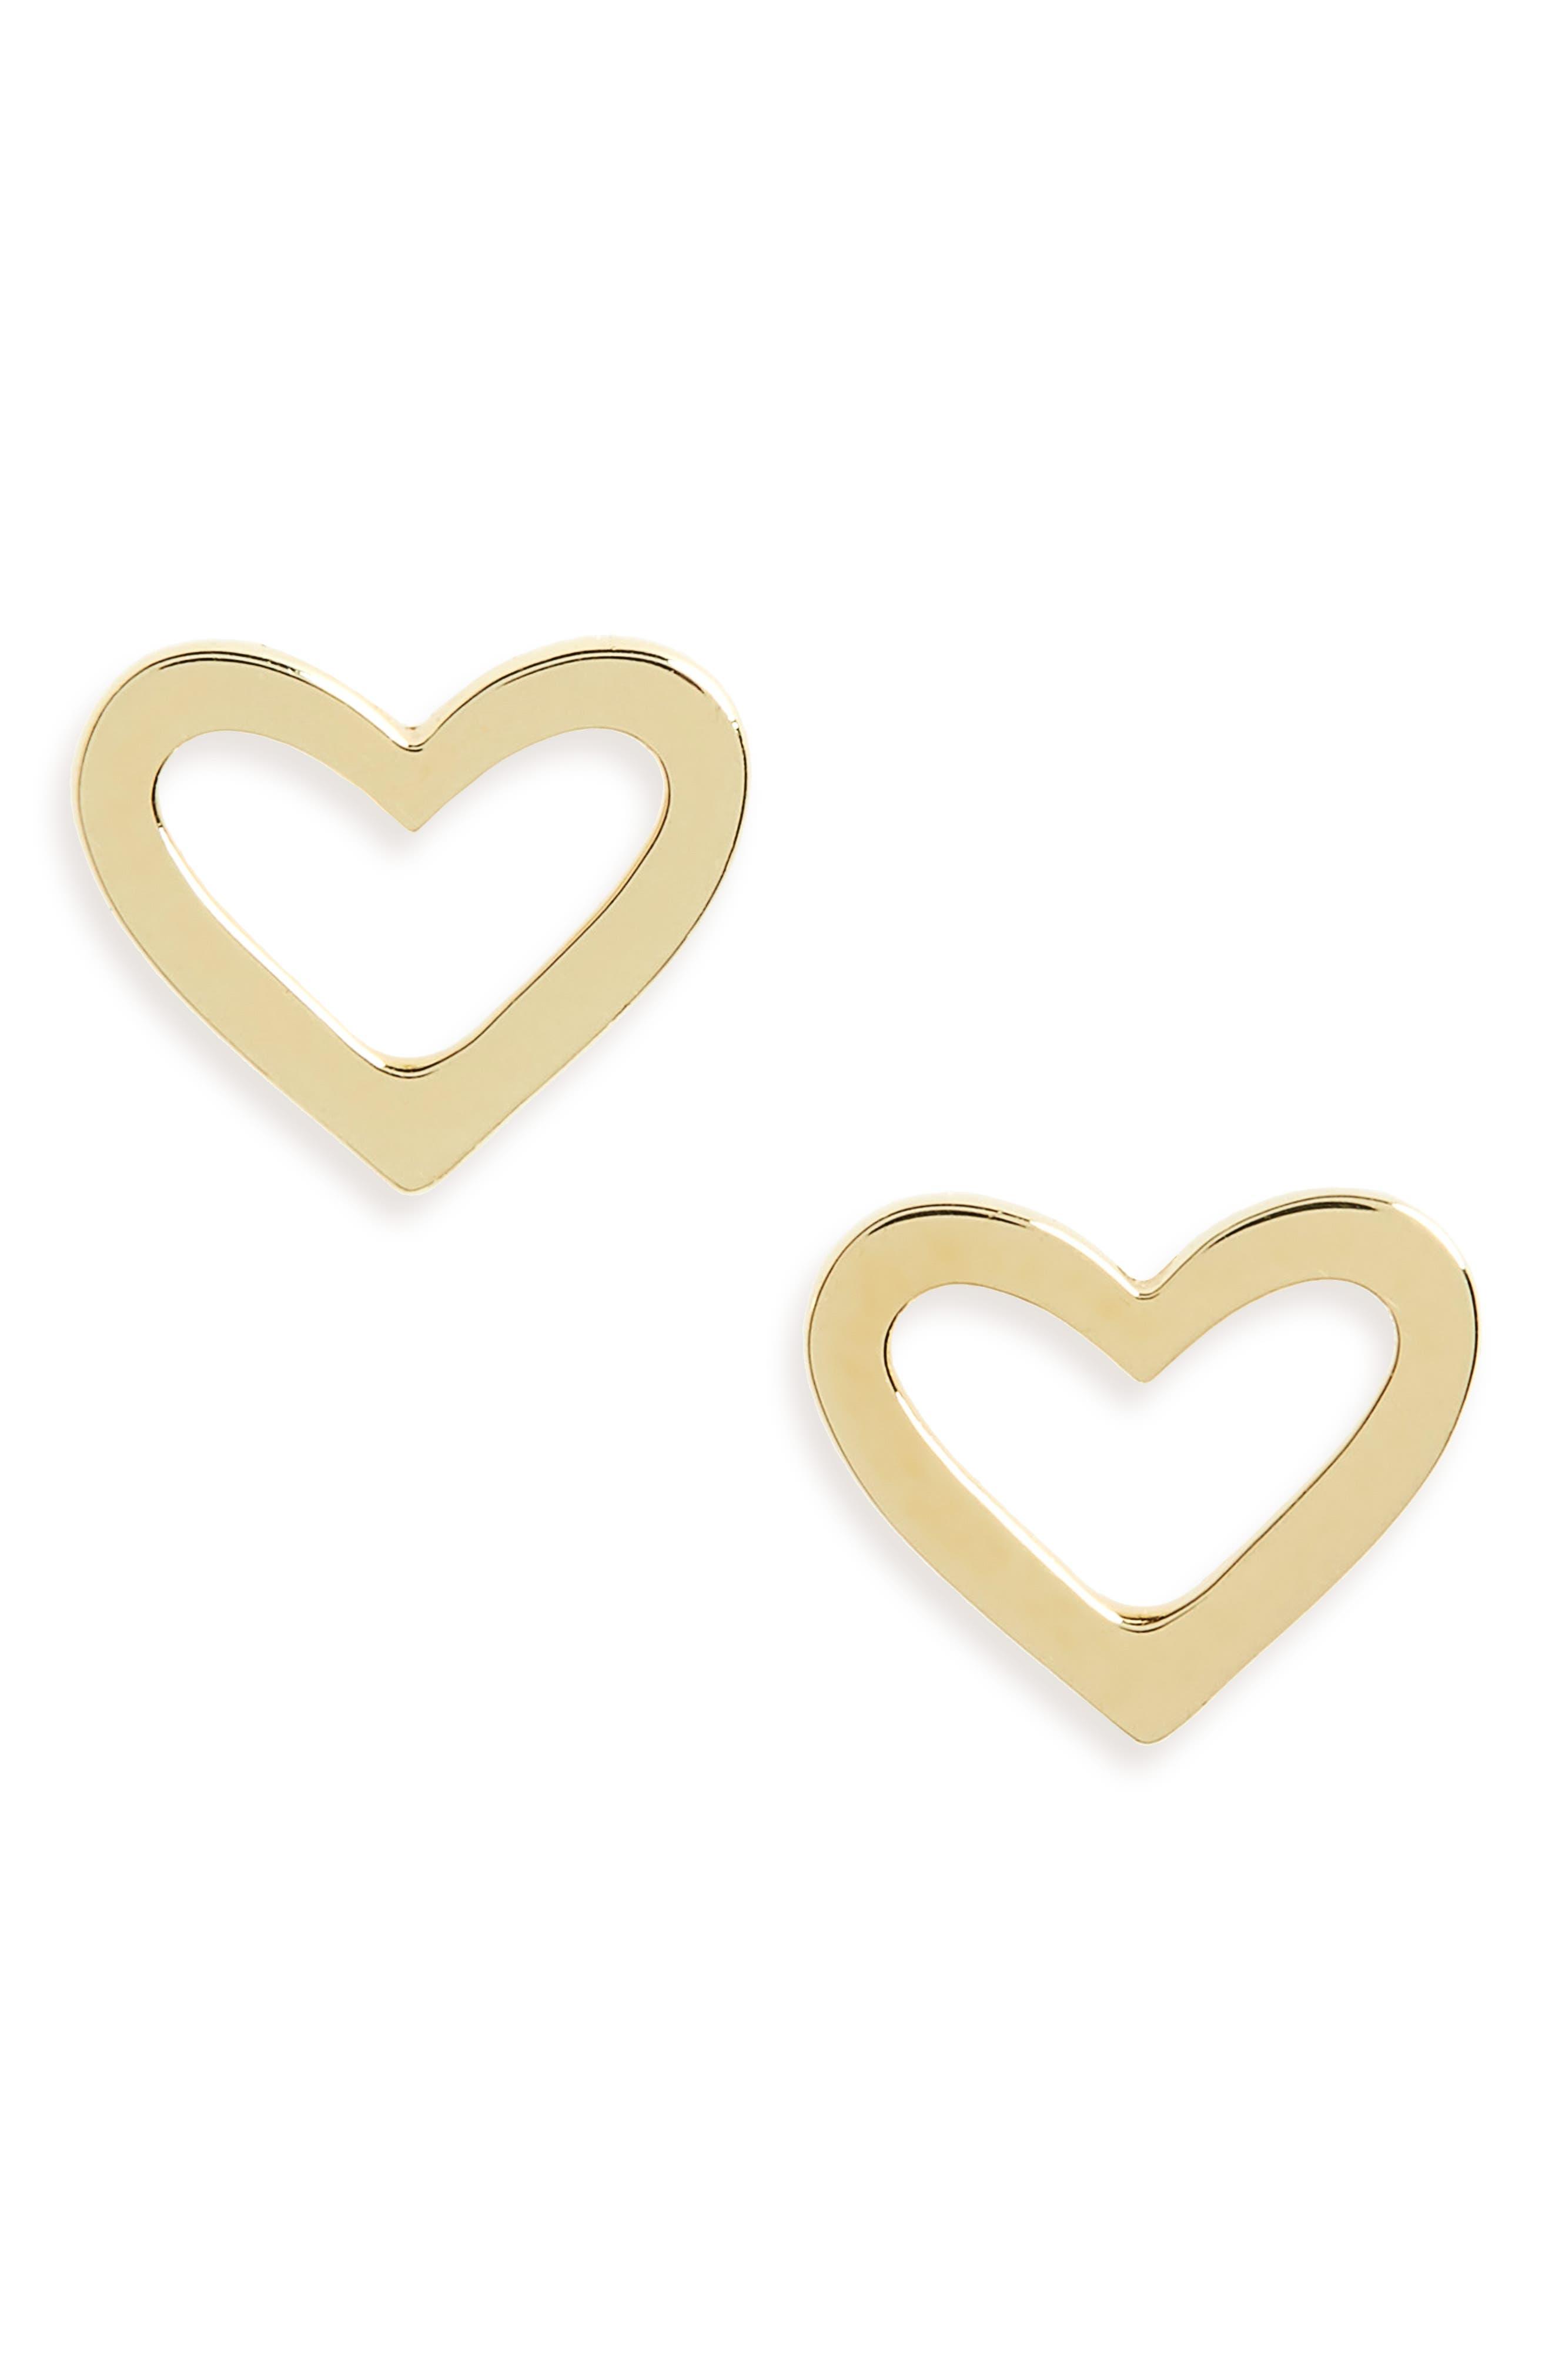 Open Heart Earrings,                             Main thumbnail 1, color,                             YELLOW GOLD